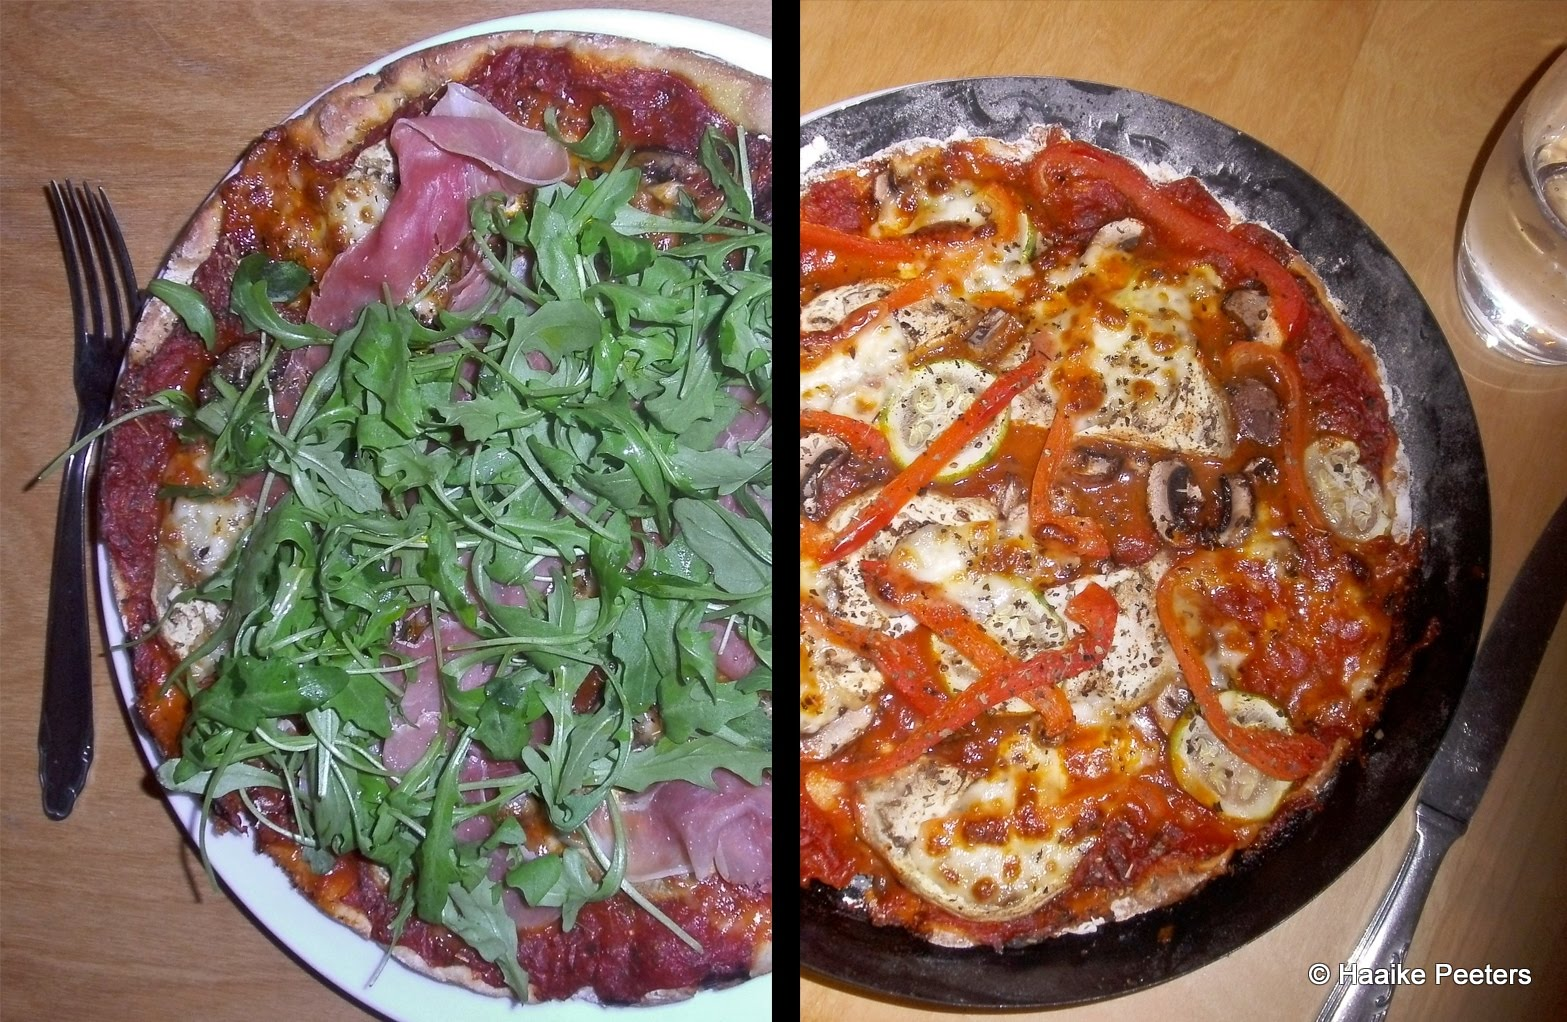 Veggie pizza (Le petit requin)